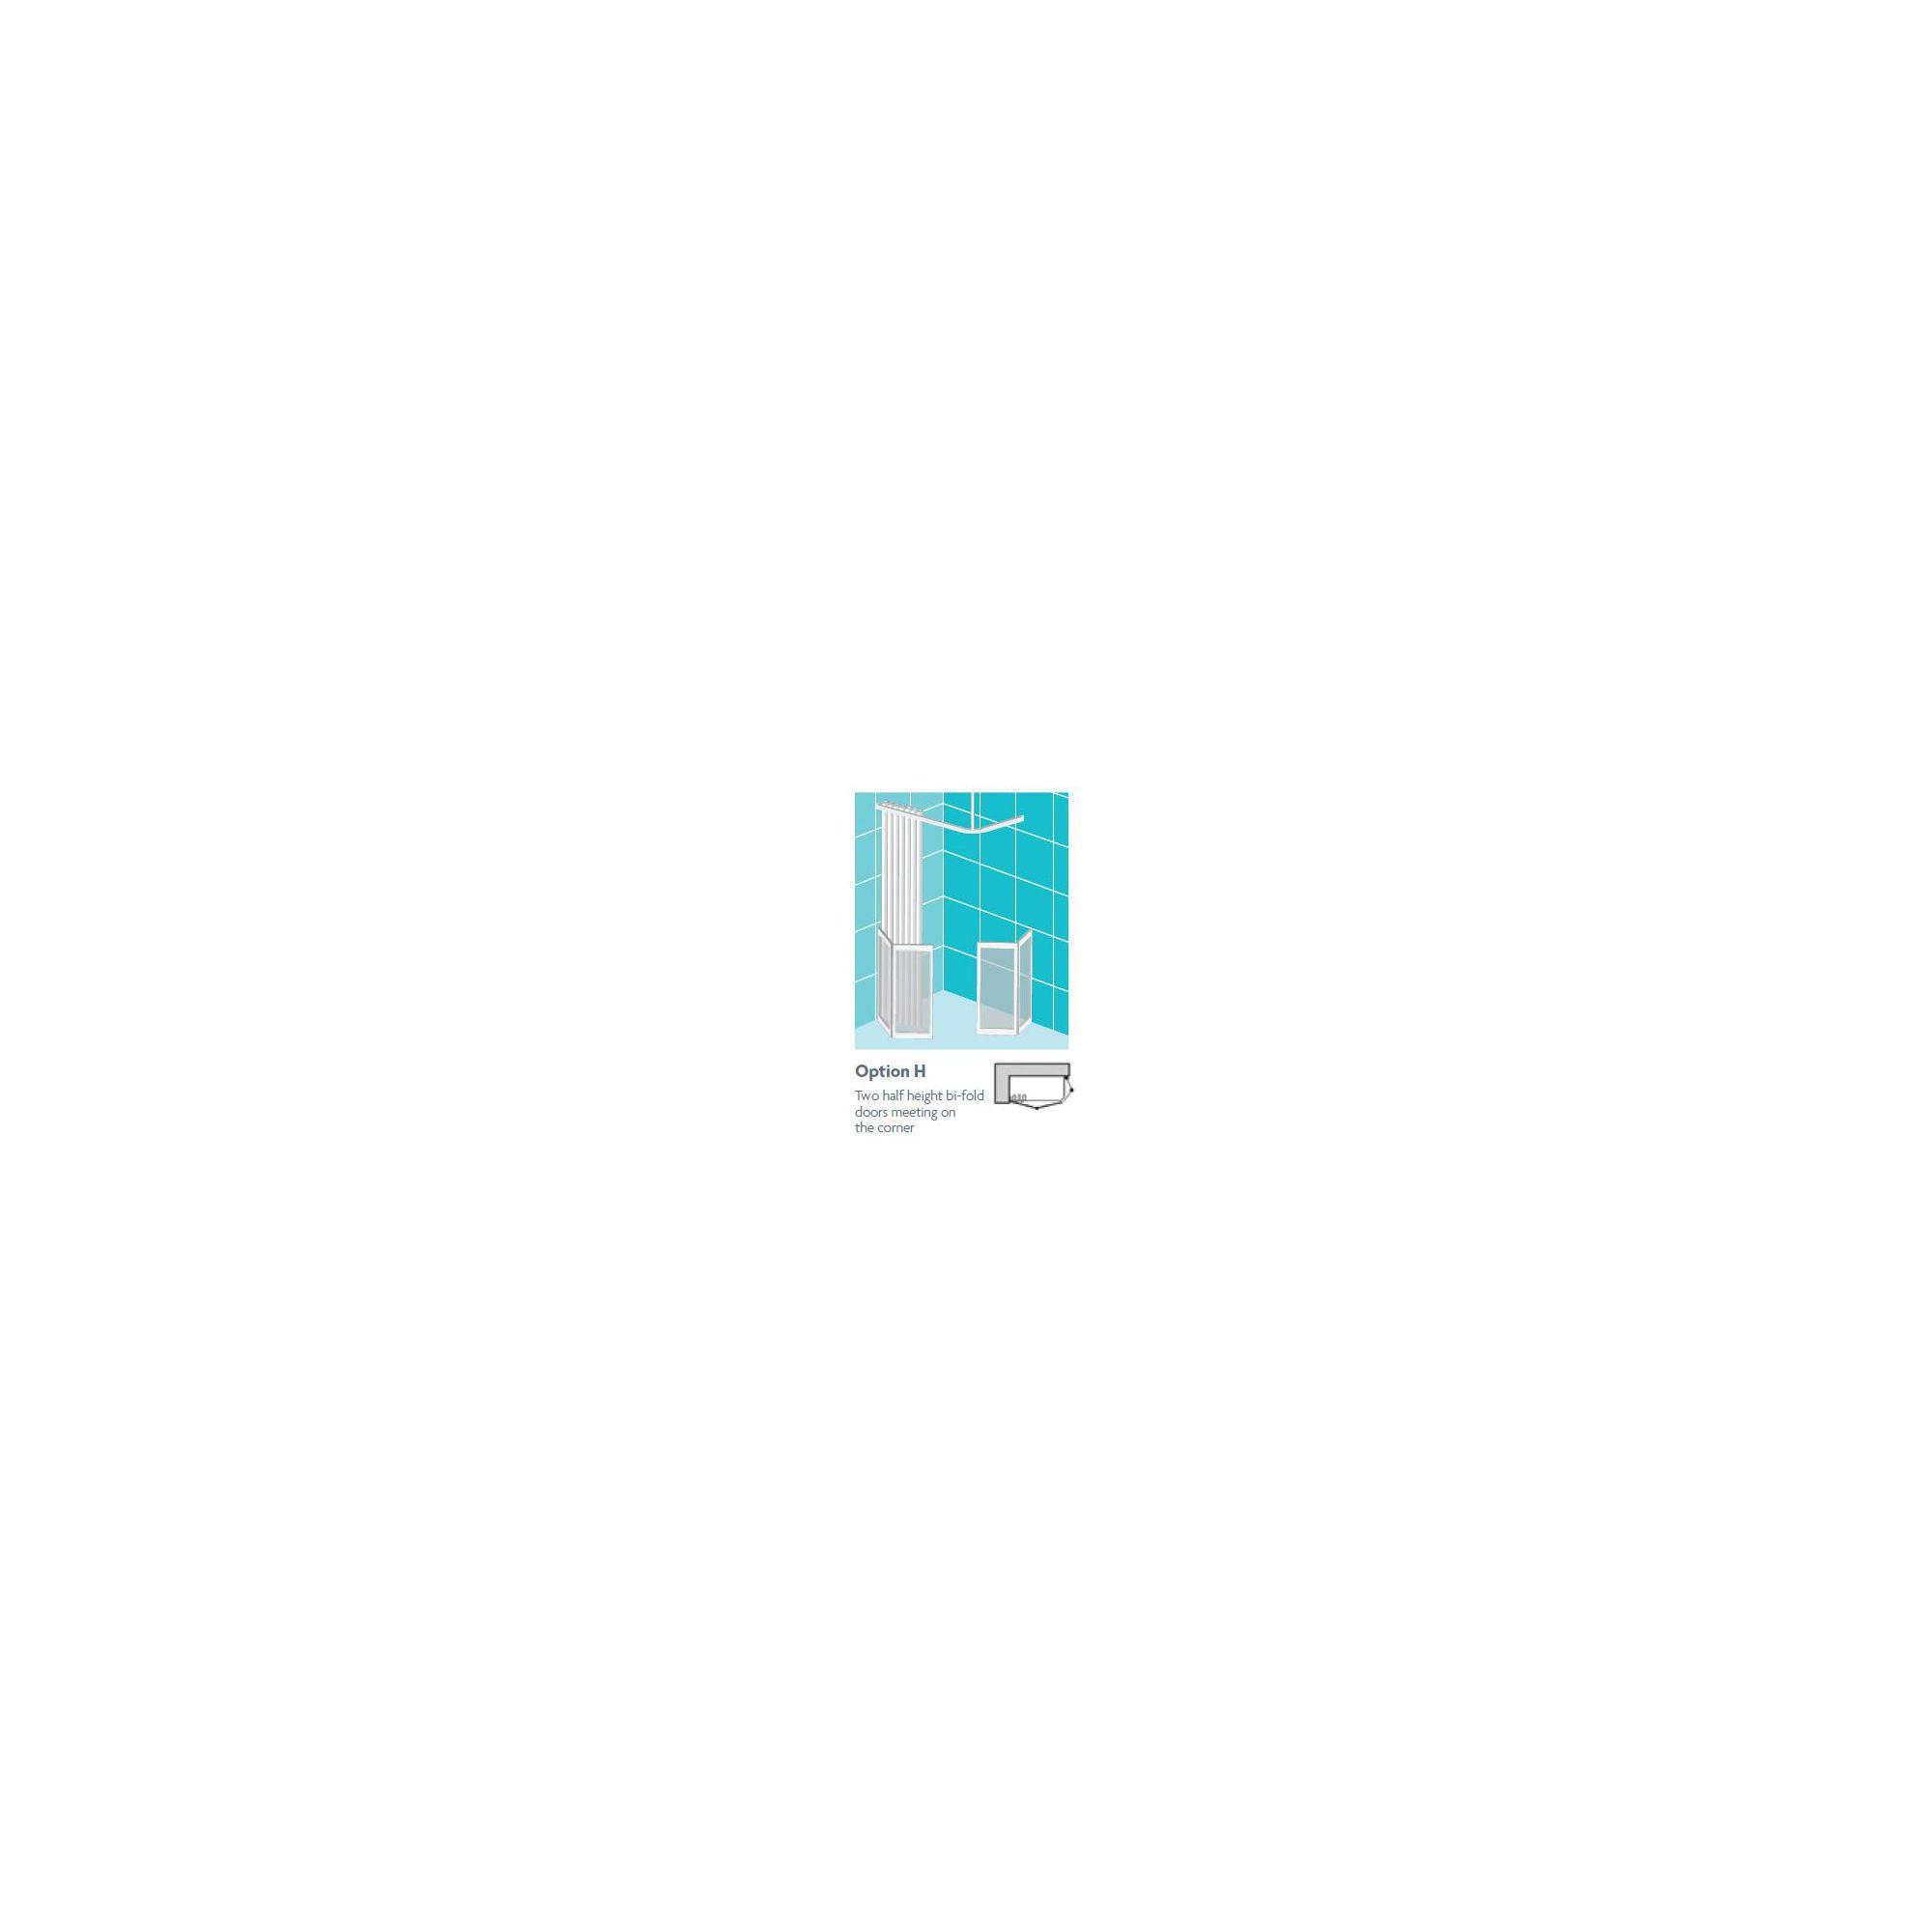 Impey Freedom Corner Door Option H Left Hand 1200mm x 900mm at Tesco Direct